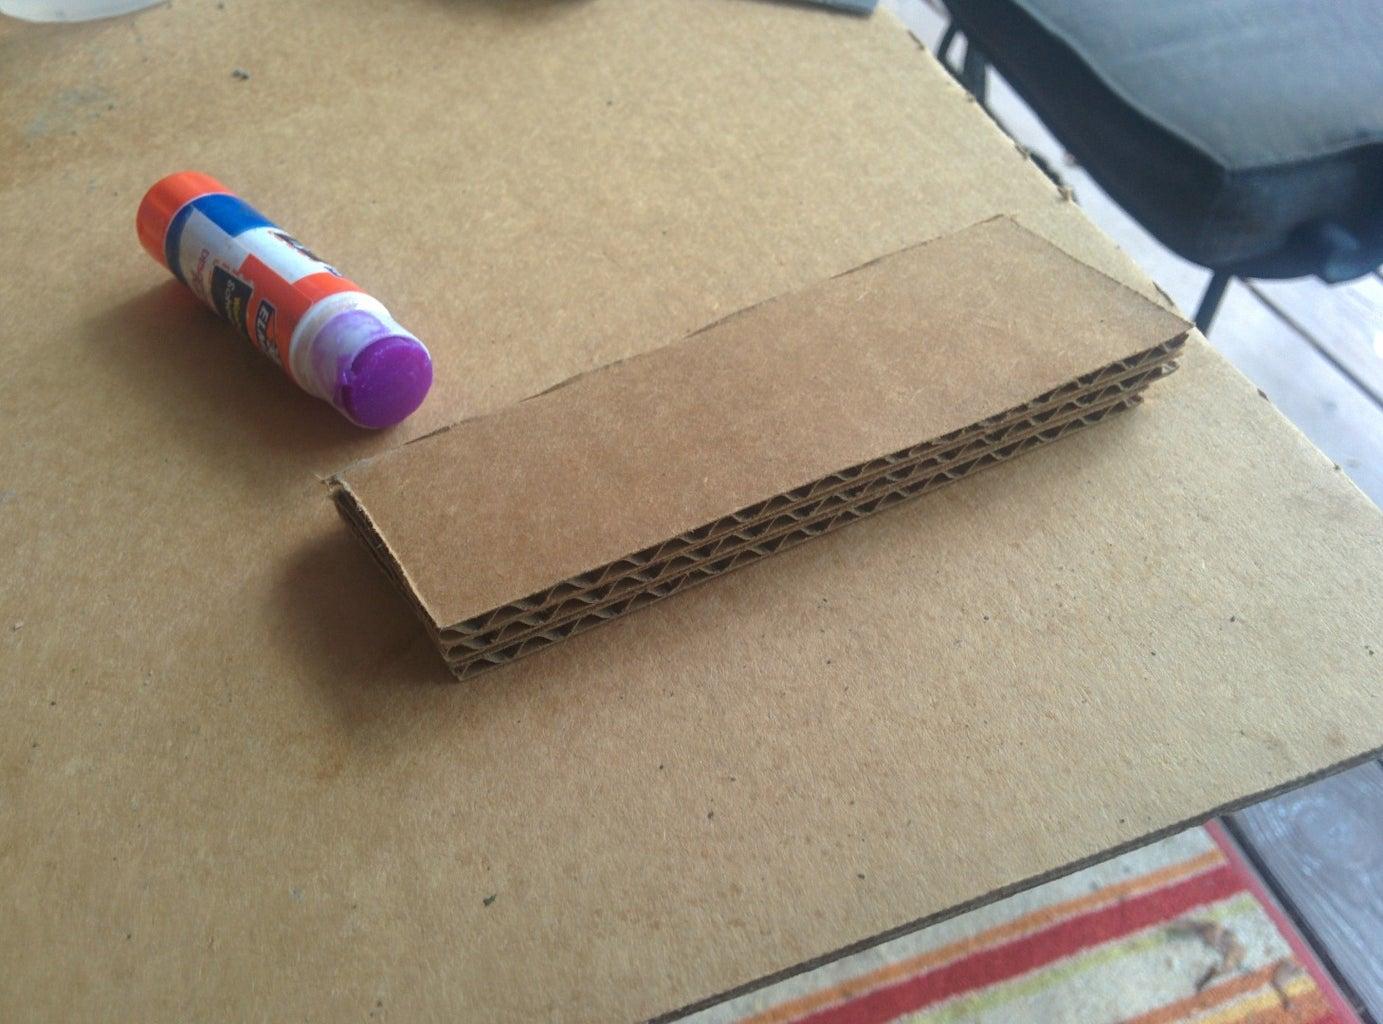 Cut Up Some Cardboard